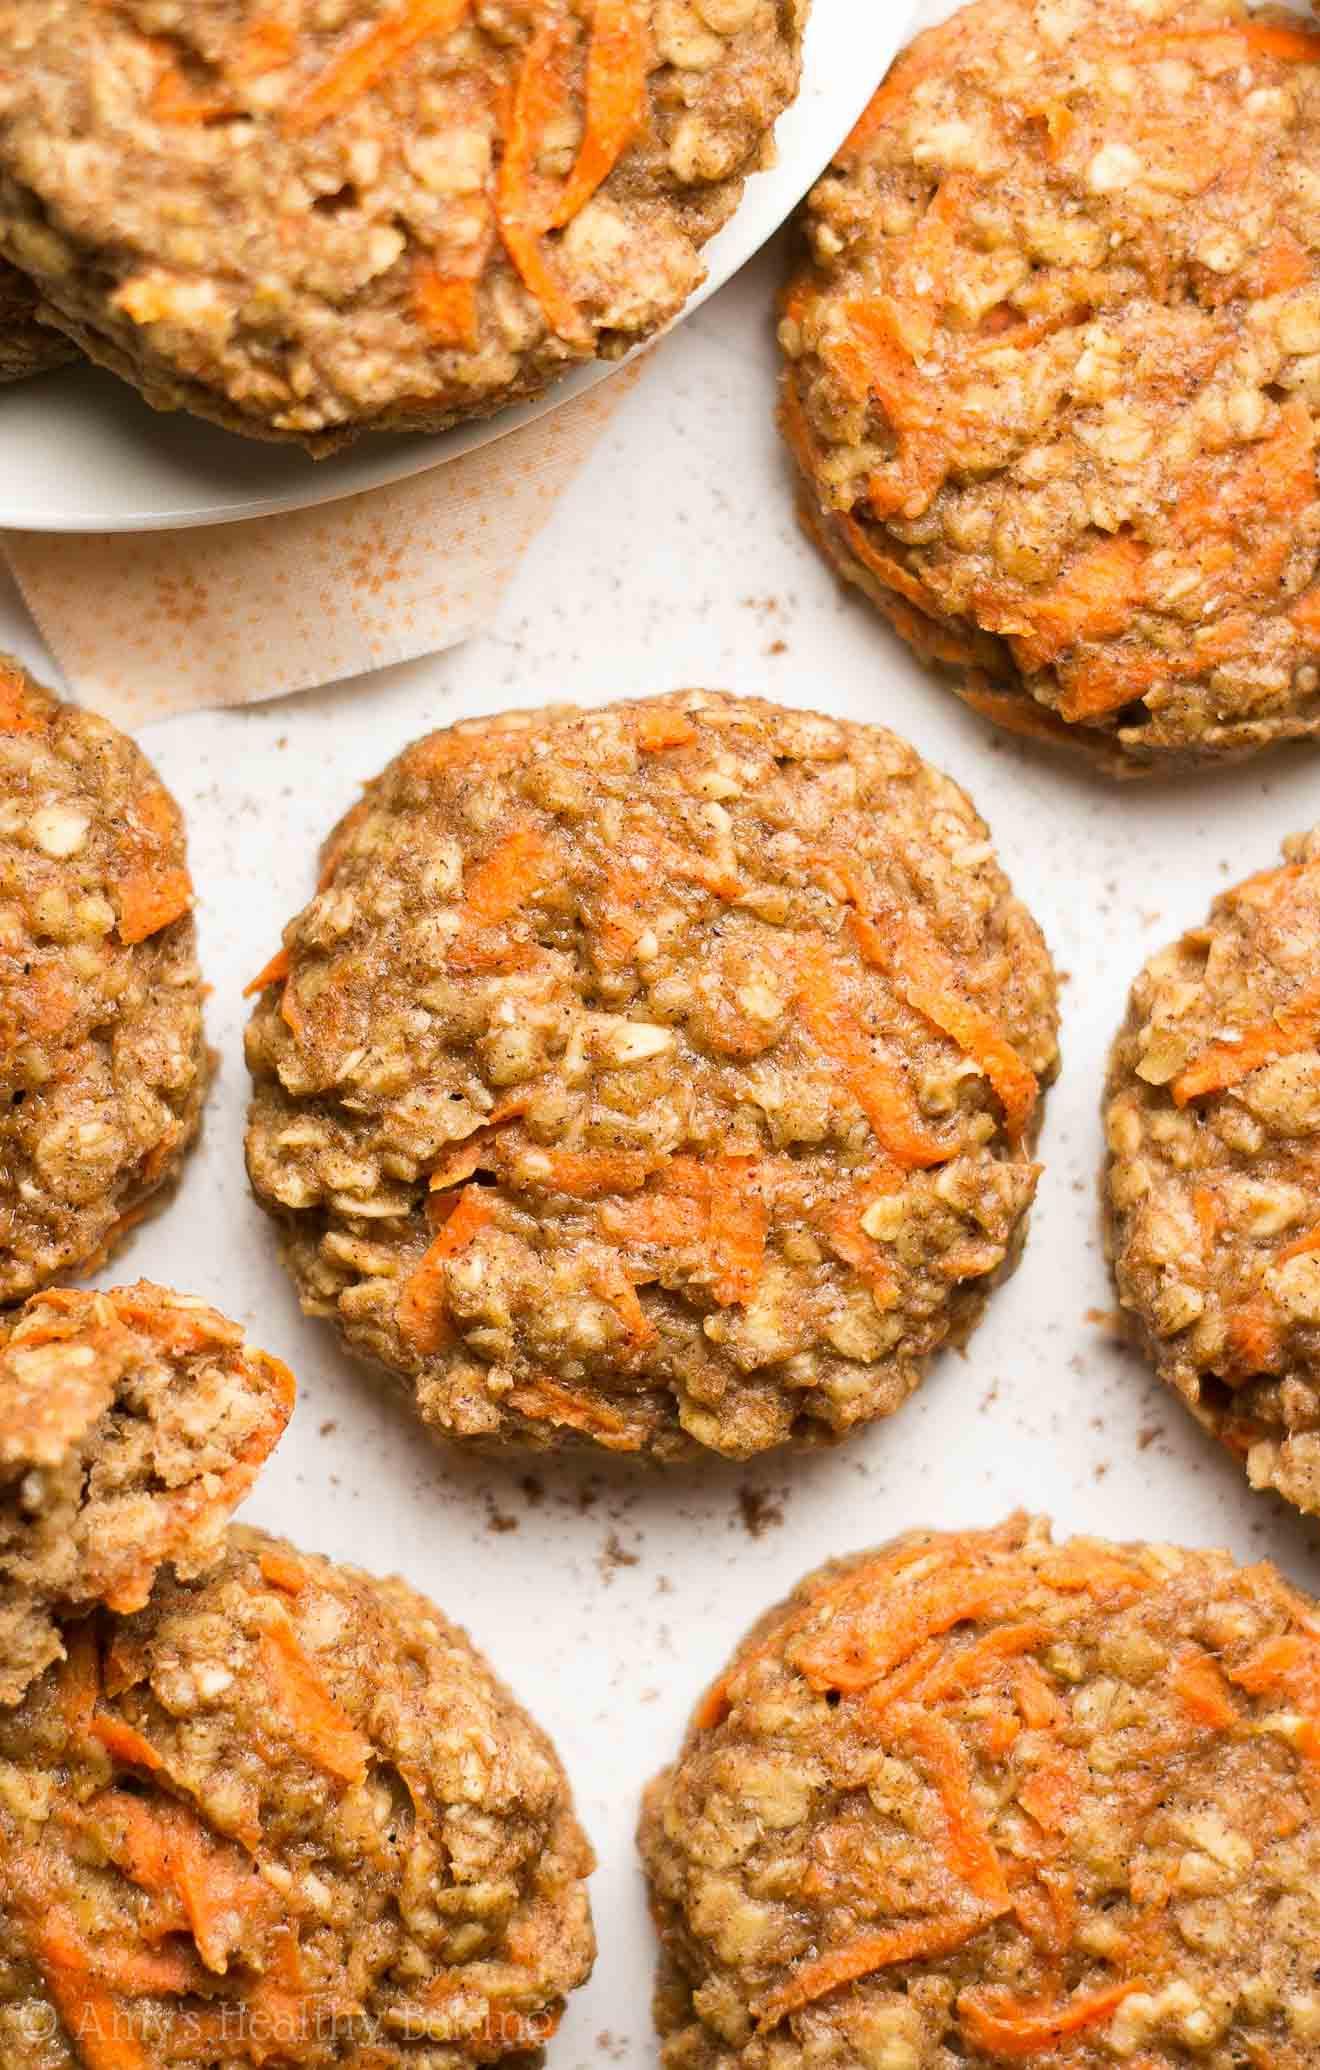 Breakfast Cookie Recipe Healthy  Healthy Carrot Cake Oatmeal Breakfast Cookies